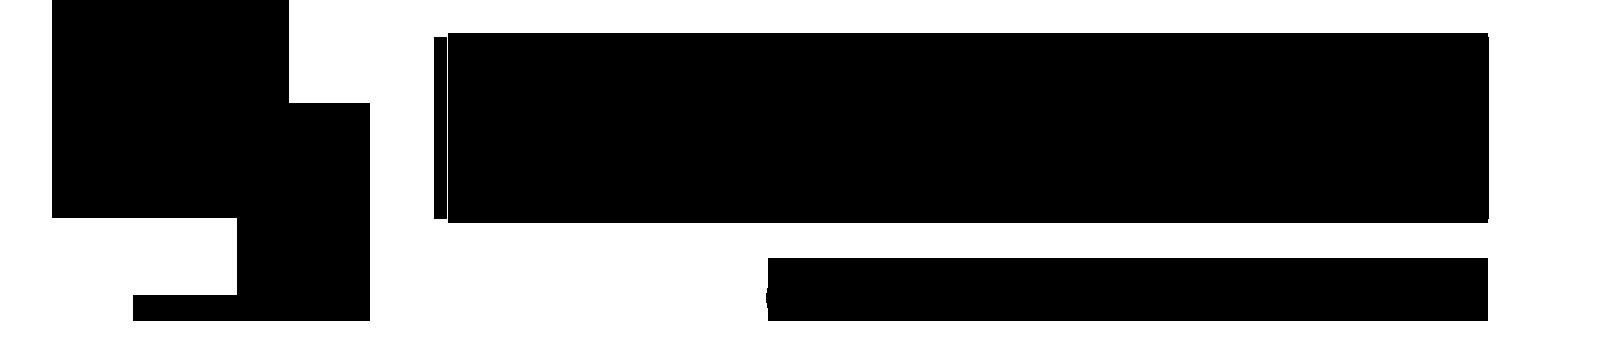 logomionuovo2016_black